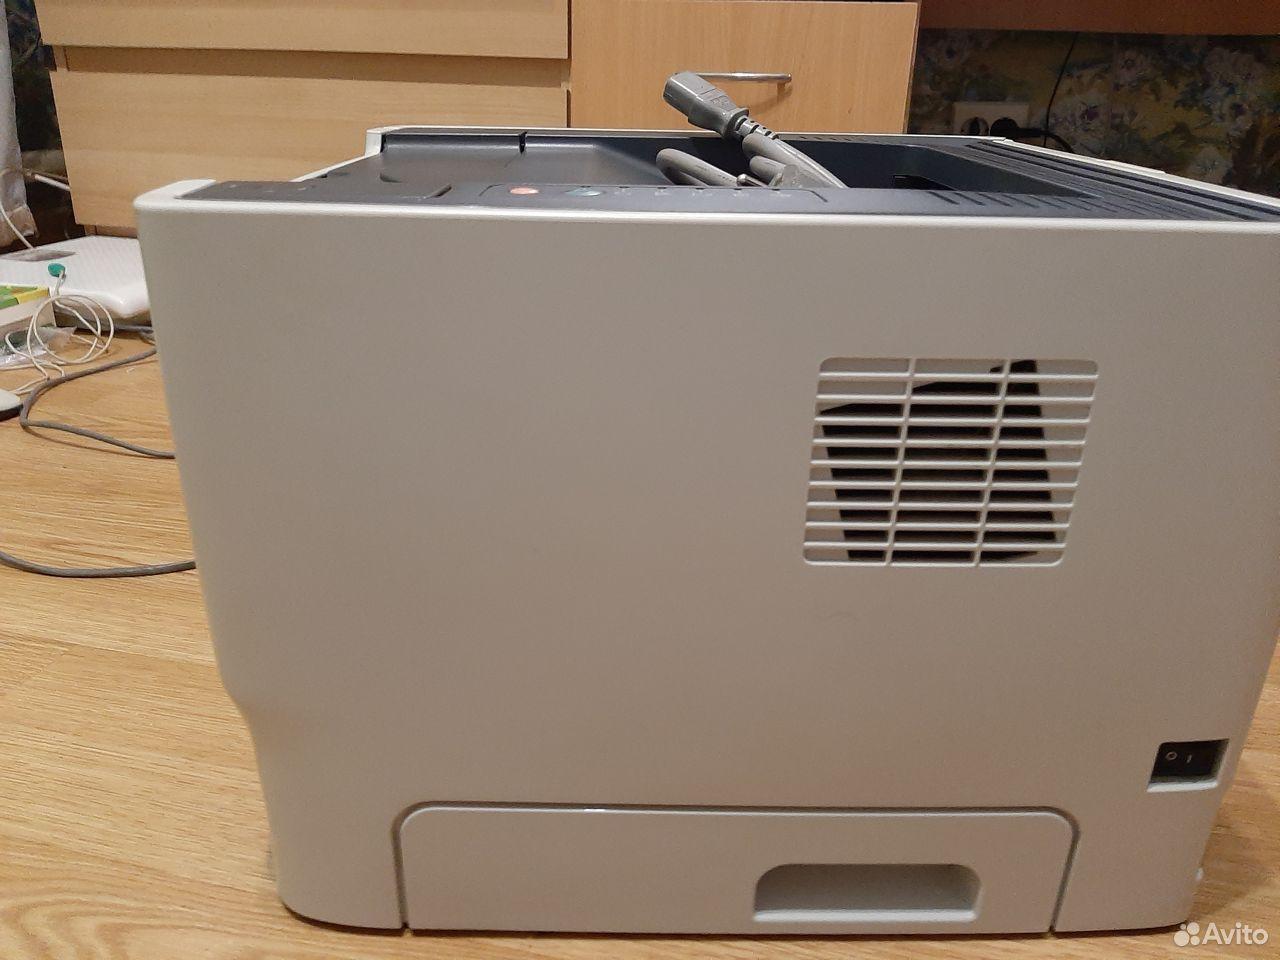 Принтер HP LaserJet P2015  89951222659 купить 3